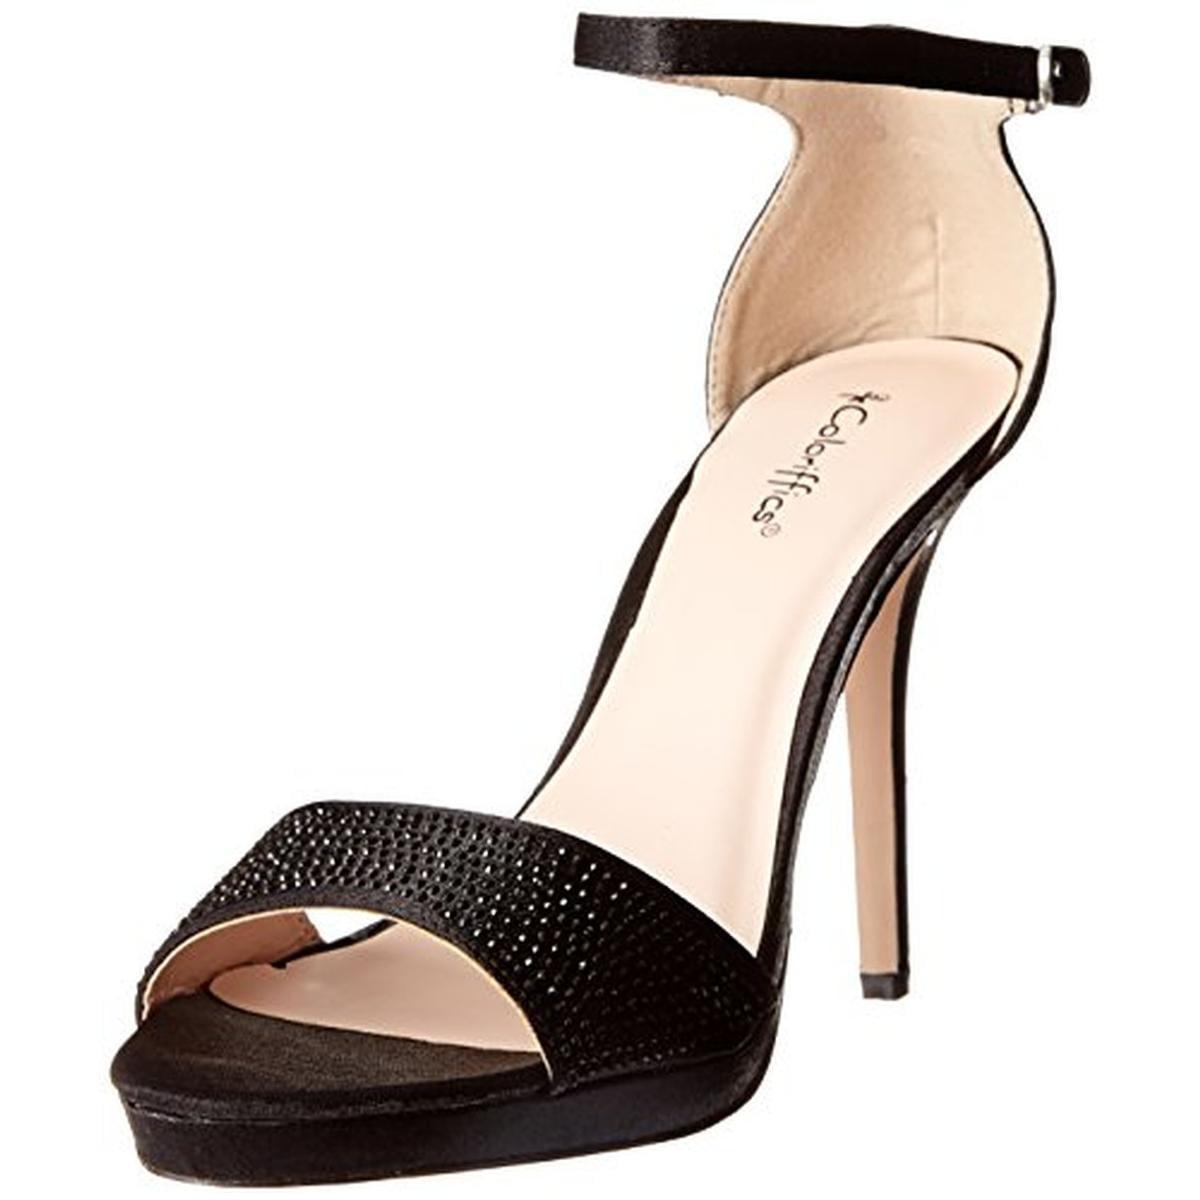 Coloriffics Womens Kayla Beaded Ankle Strap Open-Toe Heels by Coloriffics